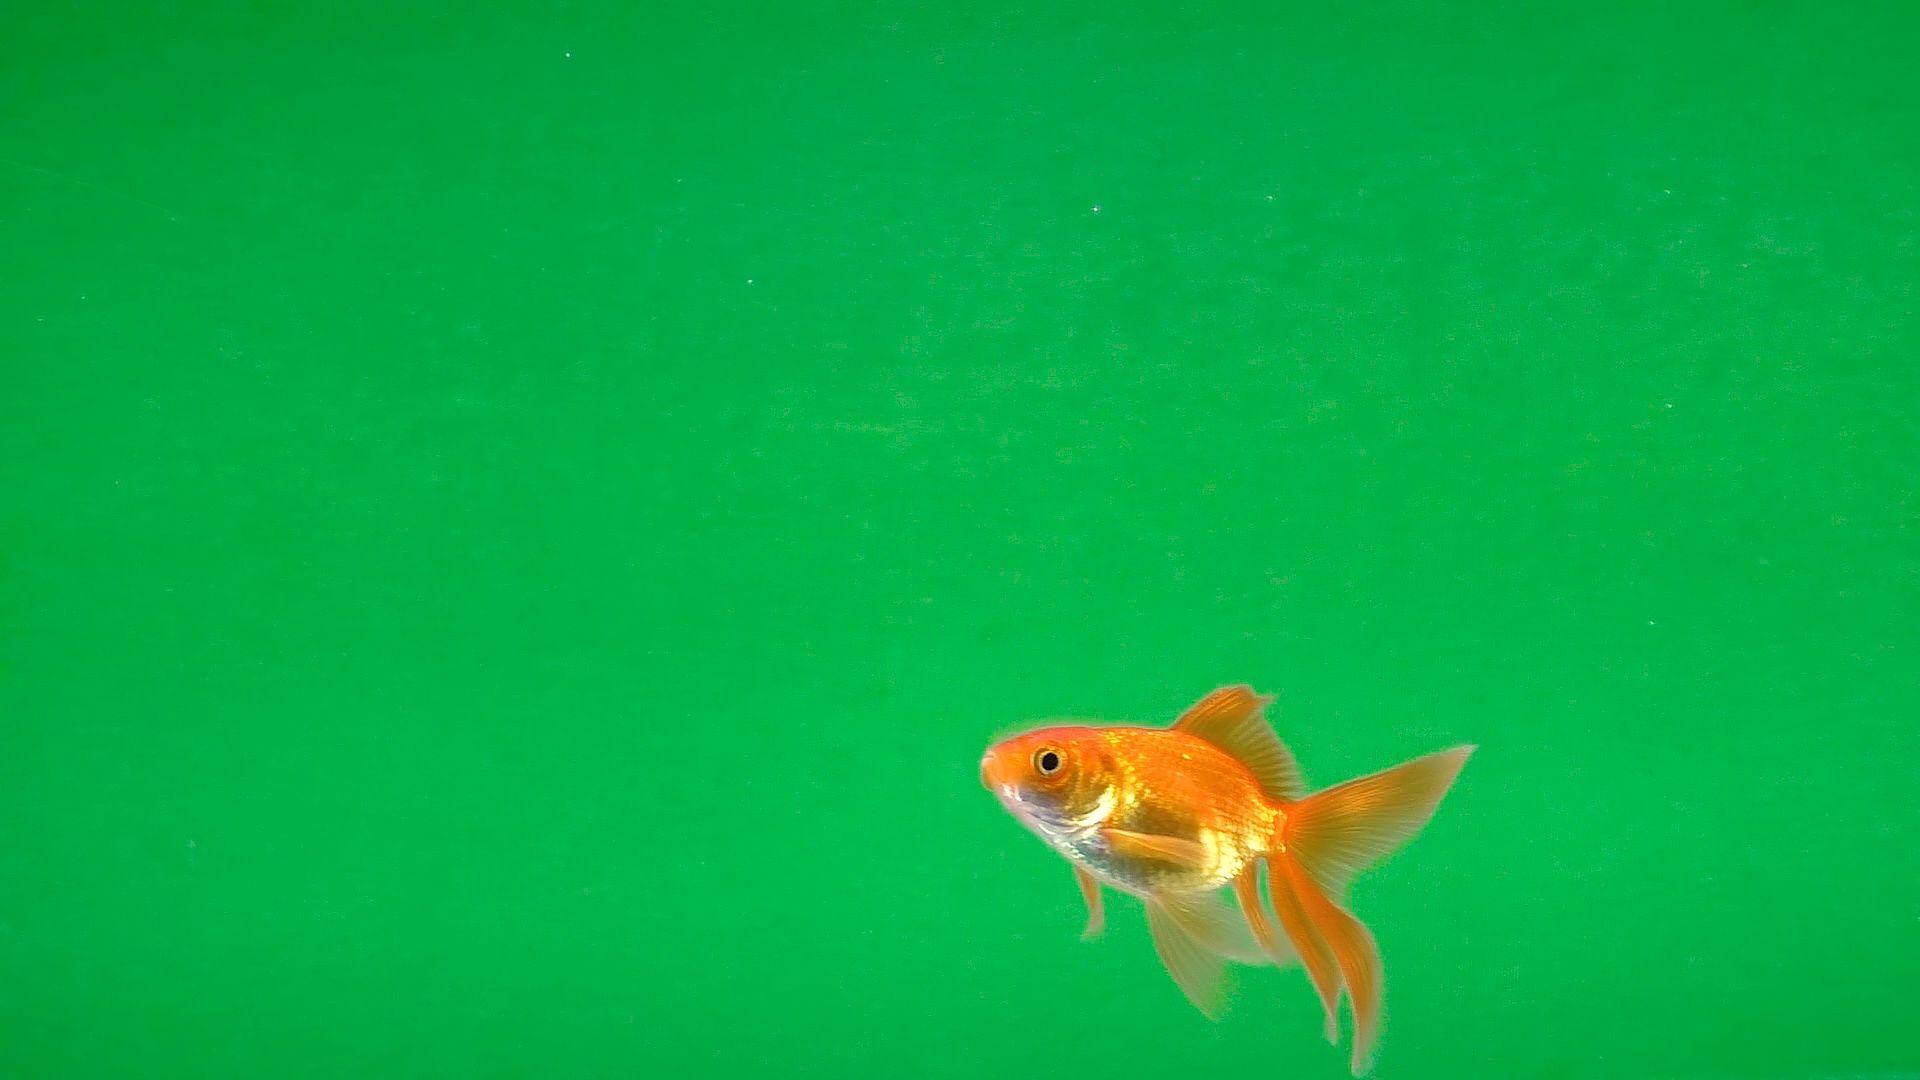 goldfish swimming free on green screen stock footage free swimming